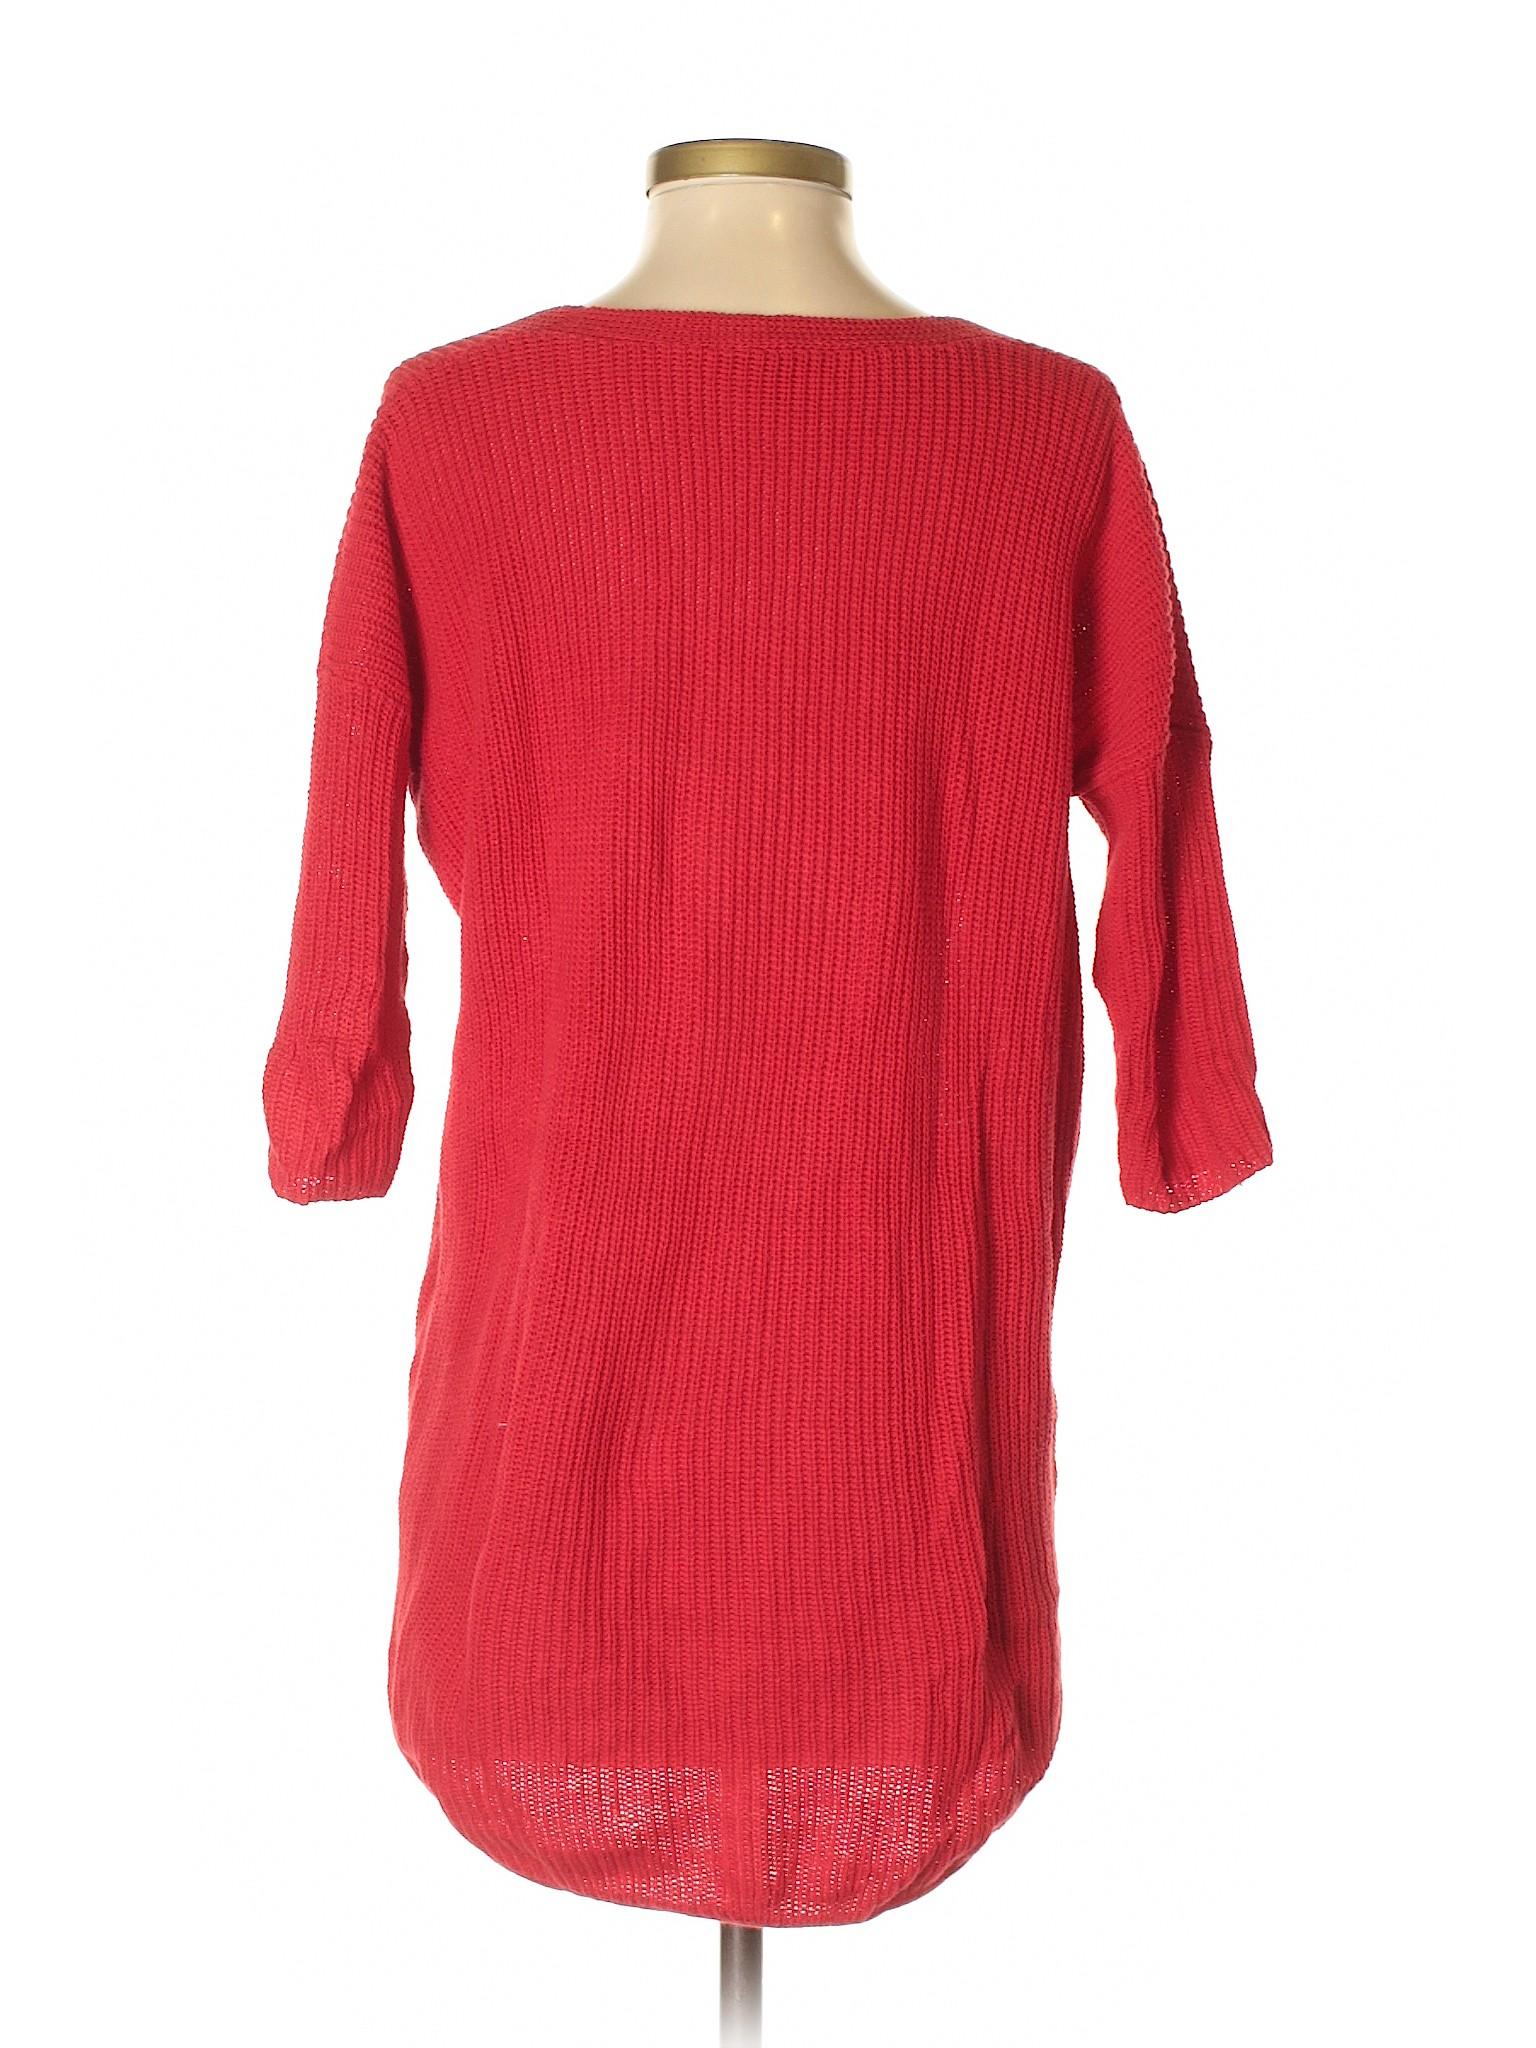 Boutique Boutique Sweater Express Sweater Pullover Express Express Boutique Pullover Pullover TTA16q